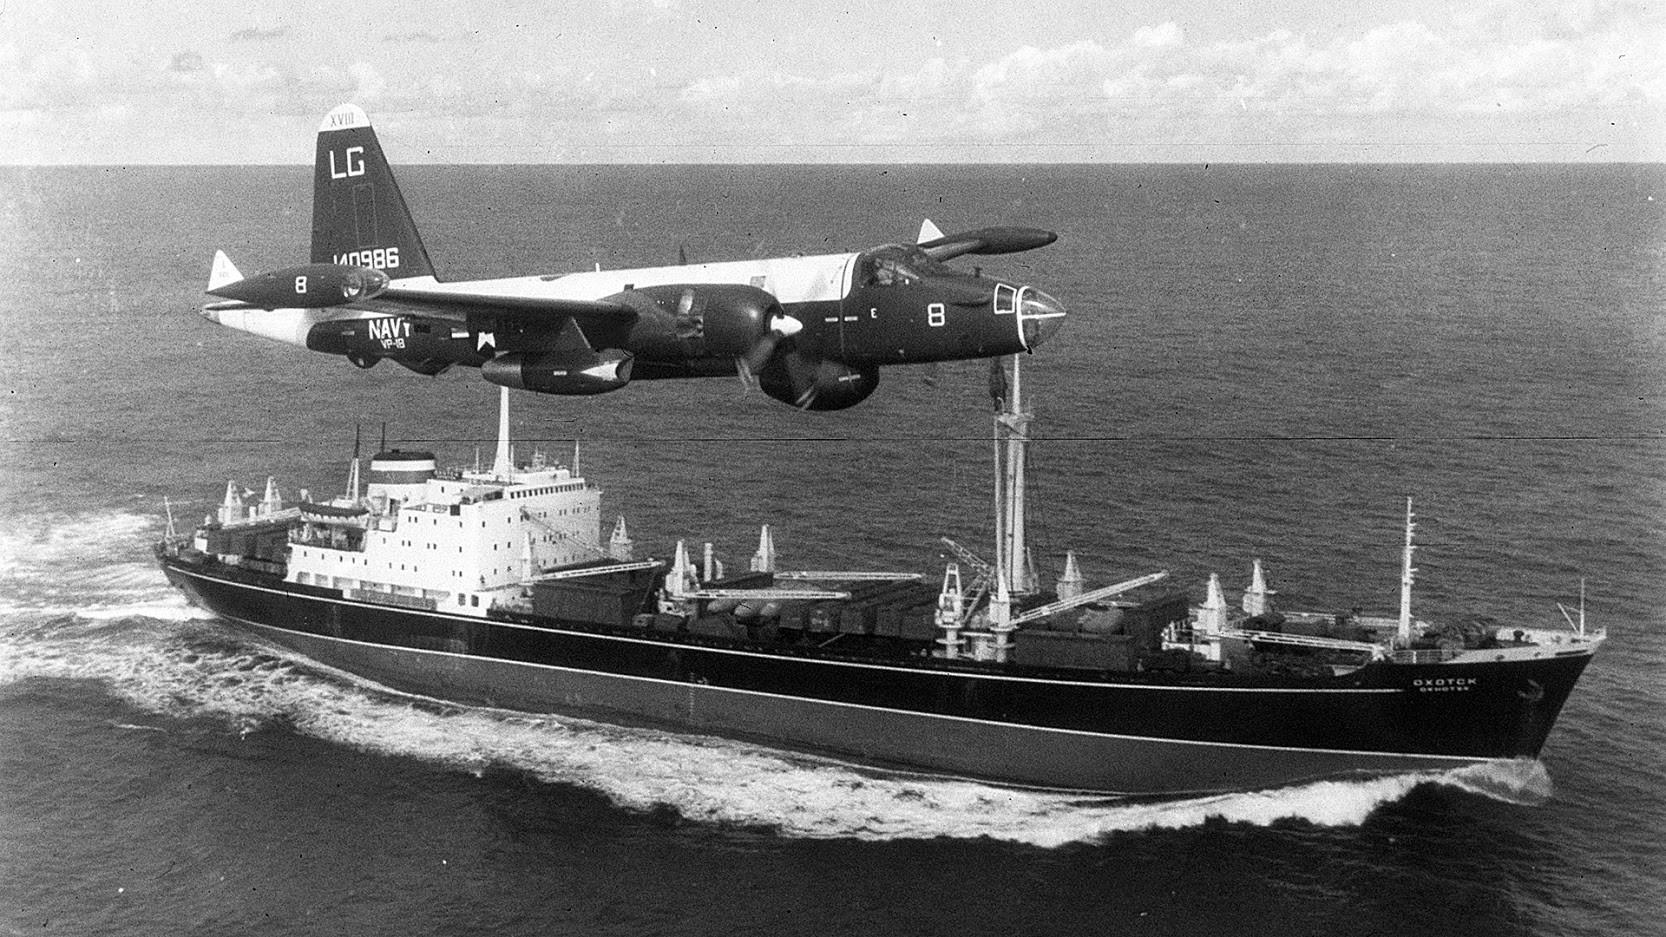 P2V Neptune, američki patrolni zrakoplov leti iznad sovjetskog teretnog broda tokom Kubanske krize.